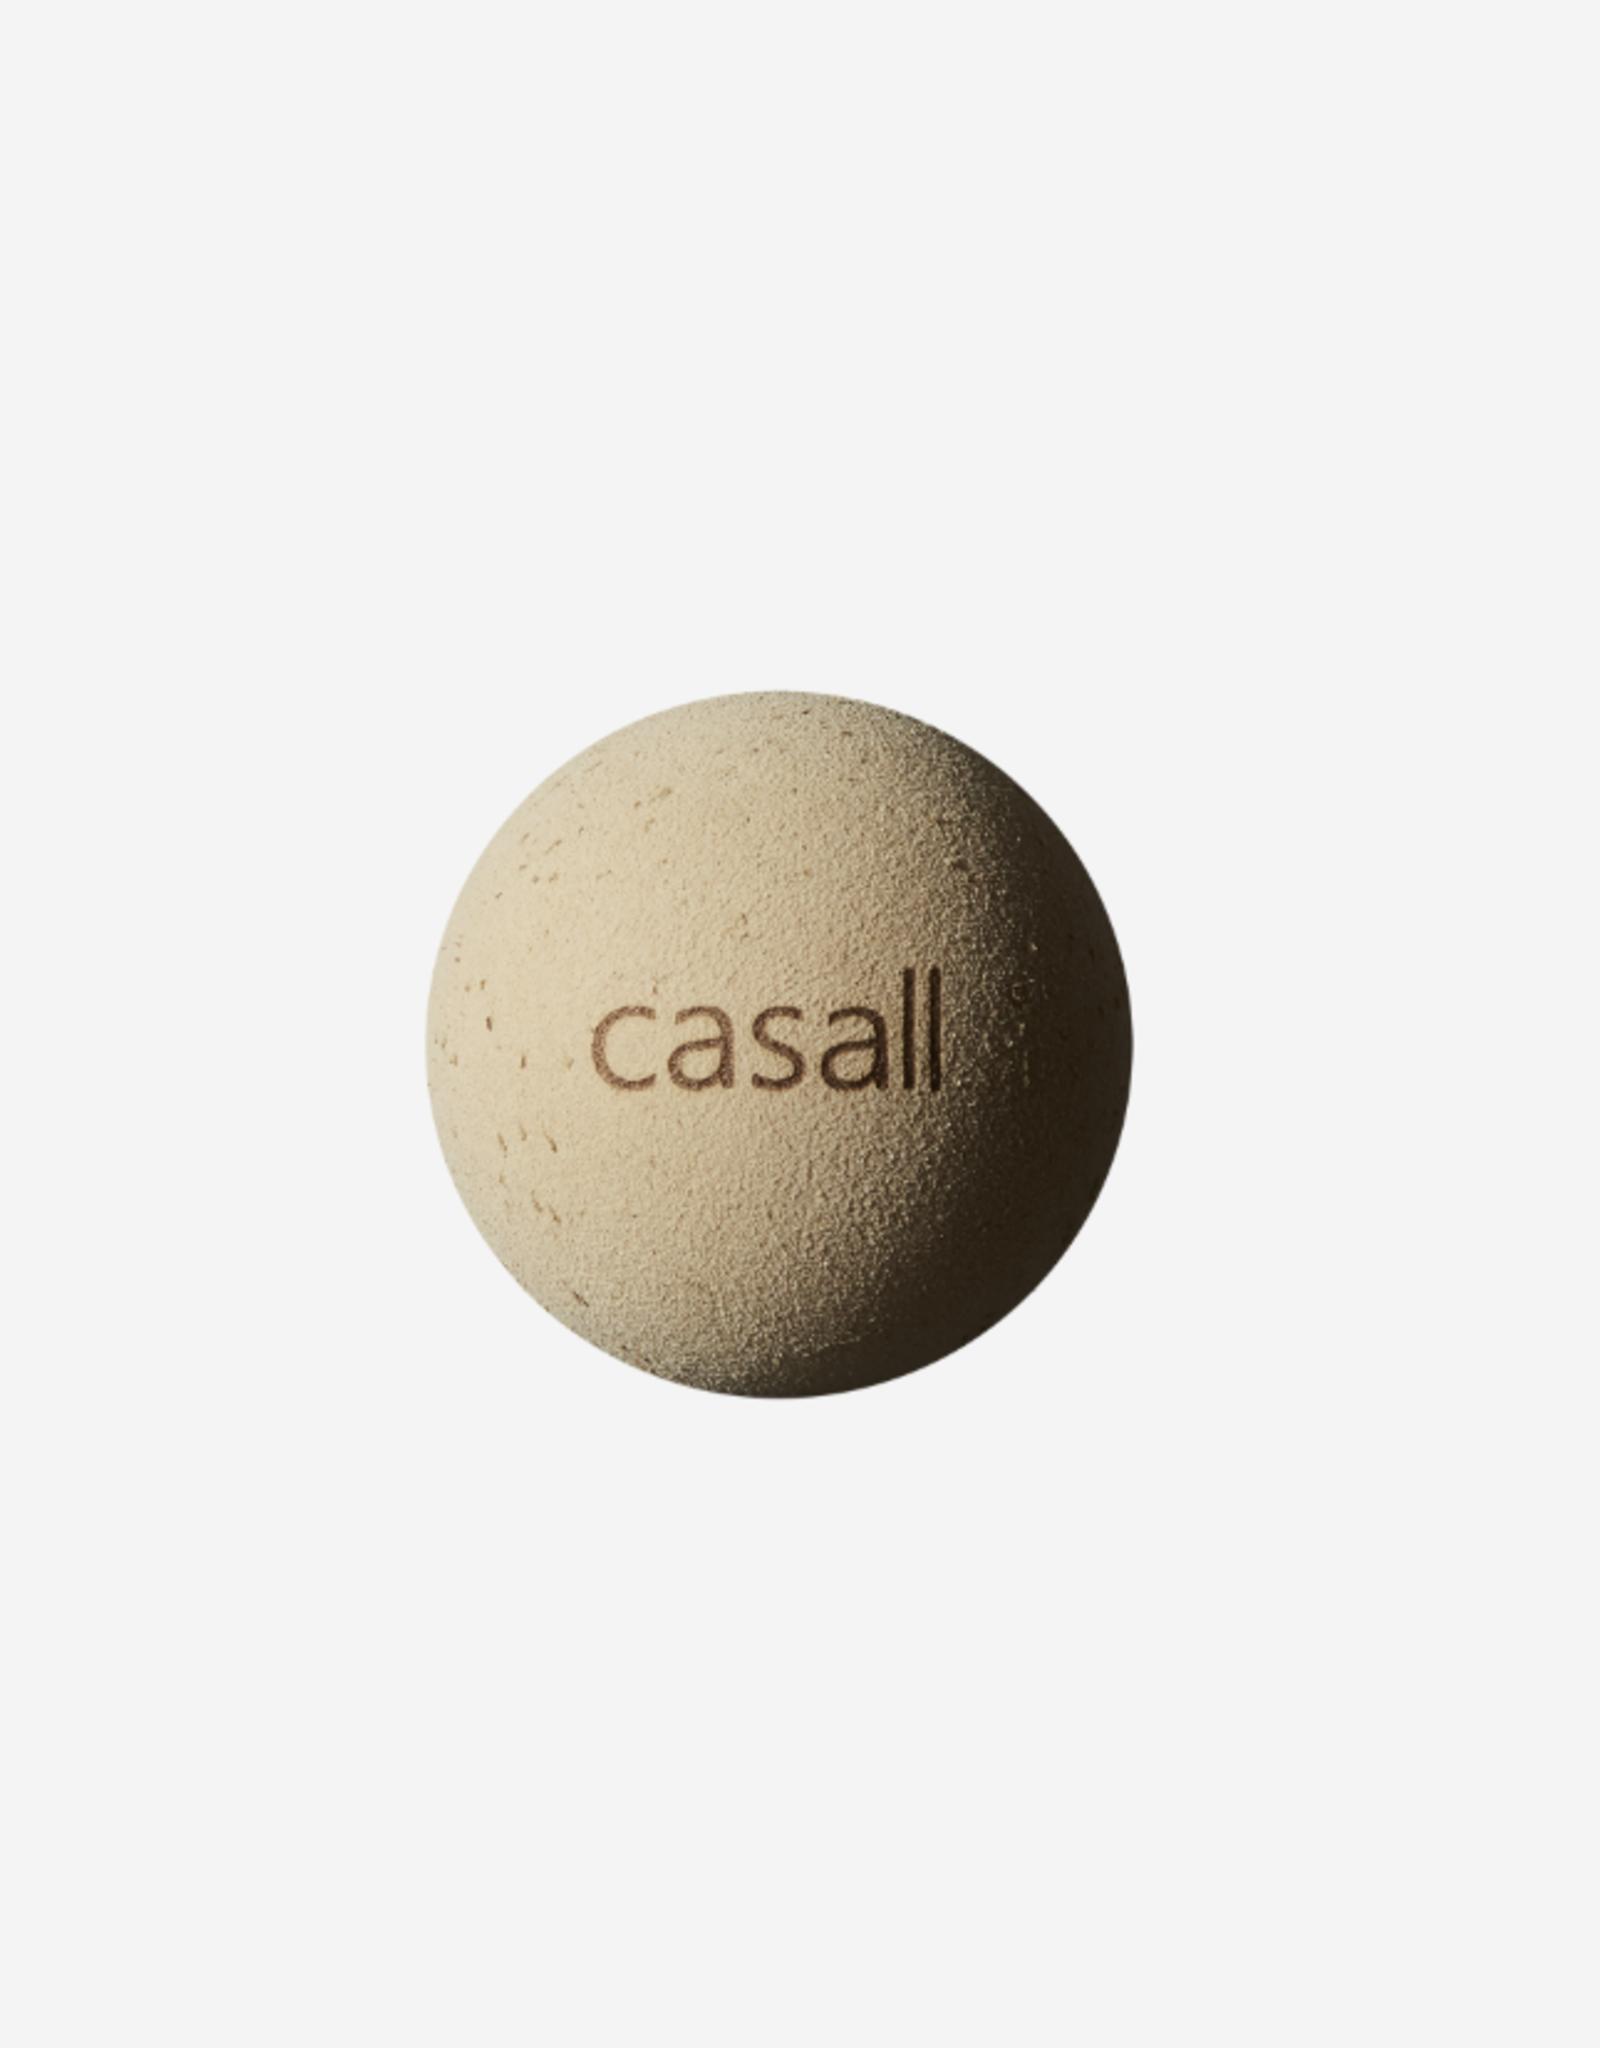 Casall Pressure point ball bamboo